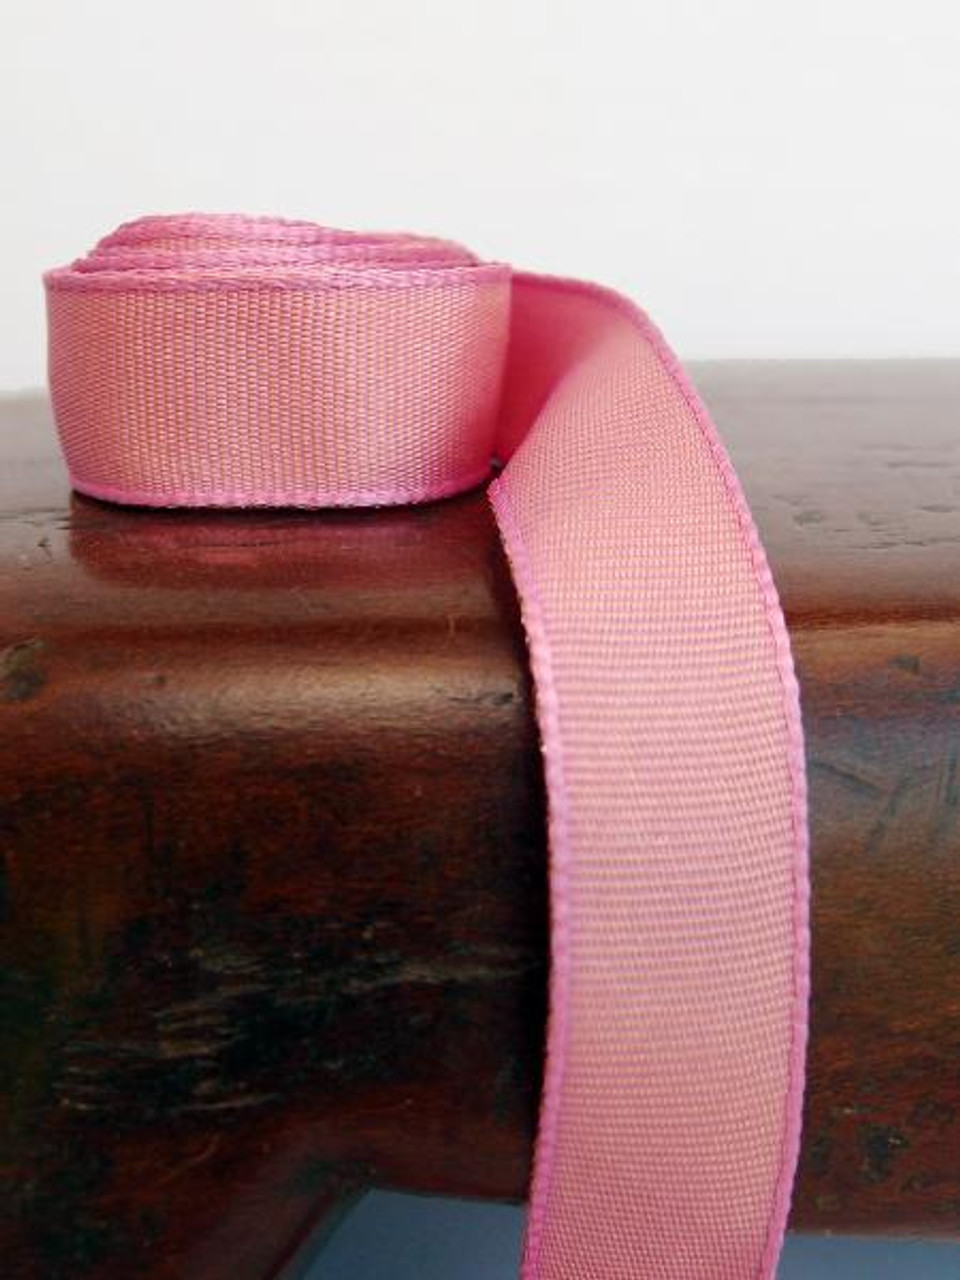 Mauve Two-Toned Grosgrain Ribbon (2 sizes)